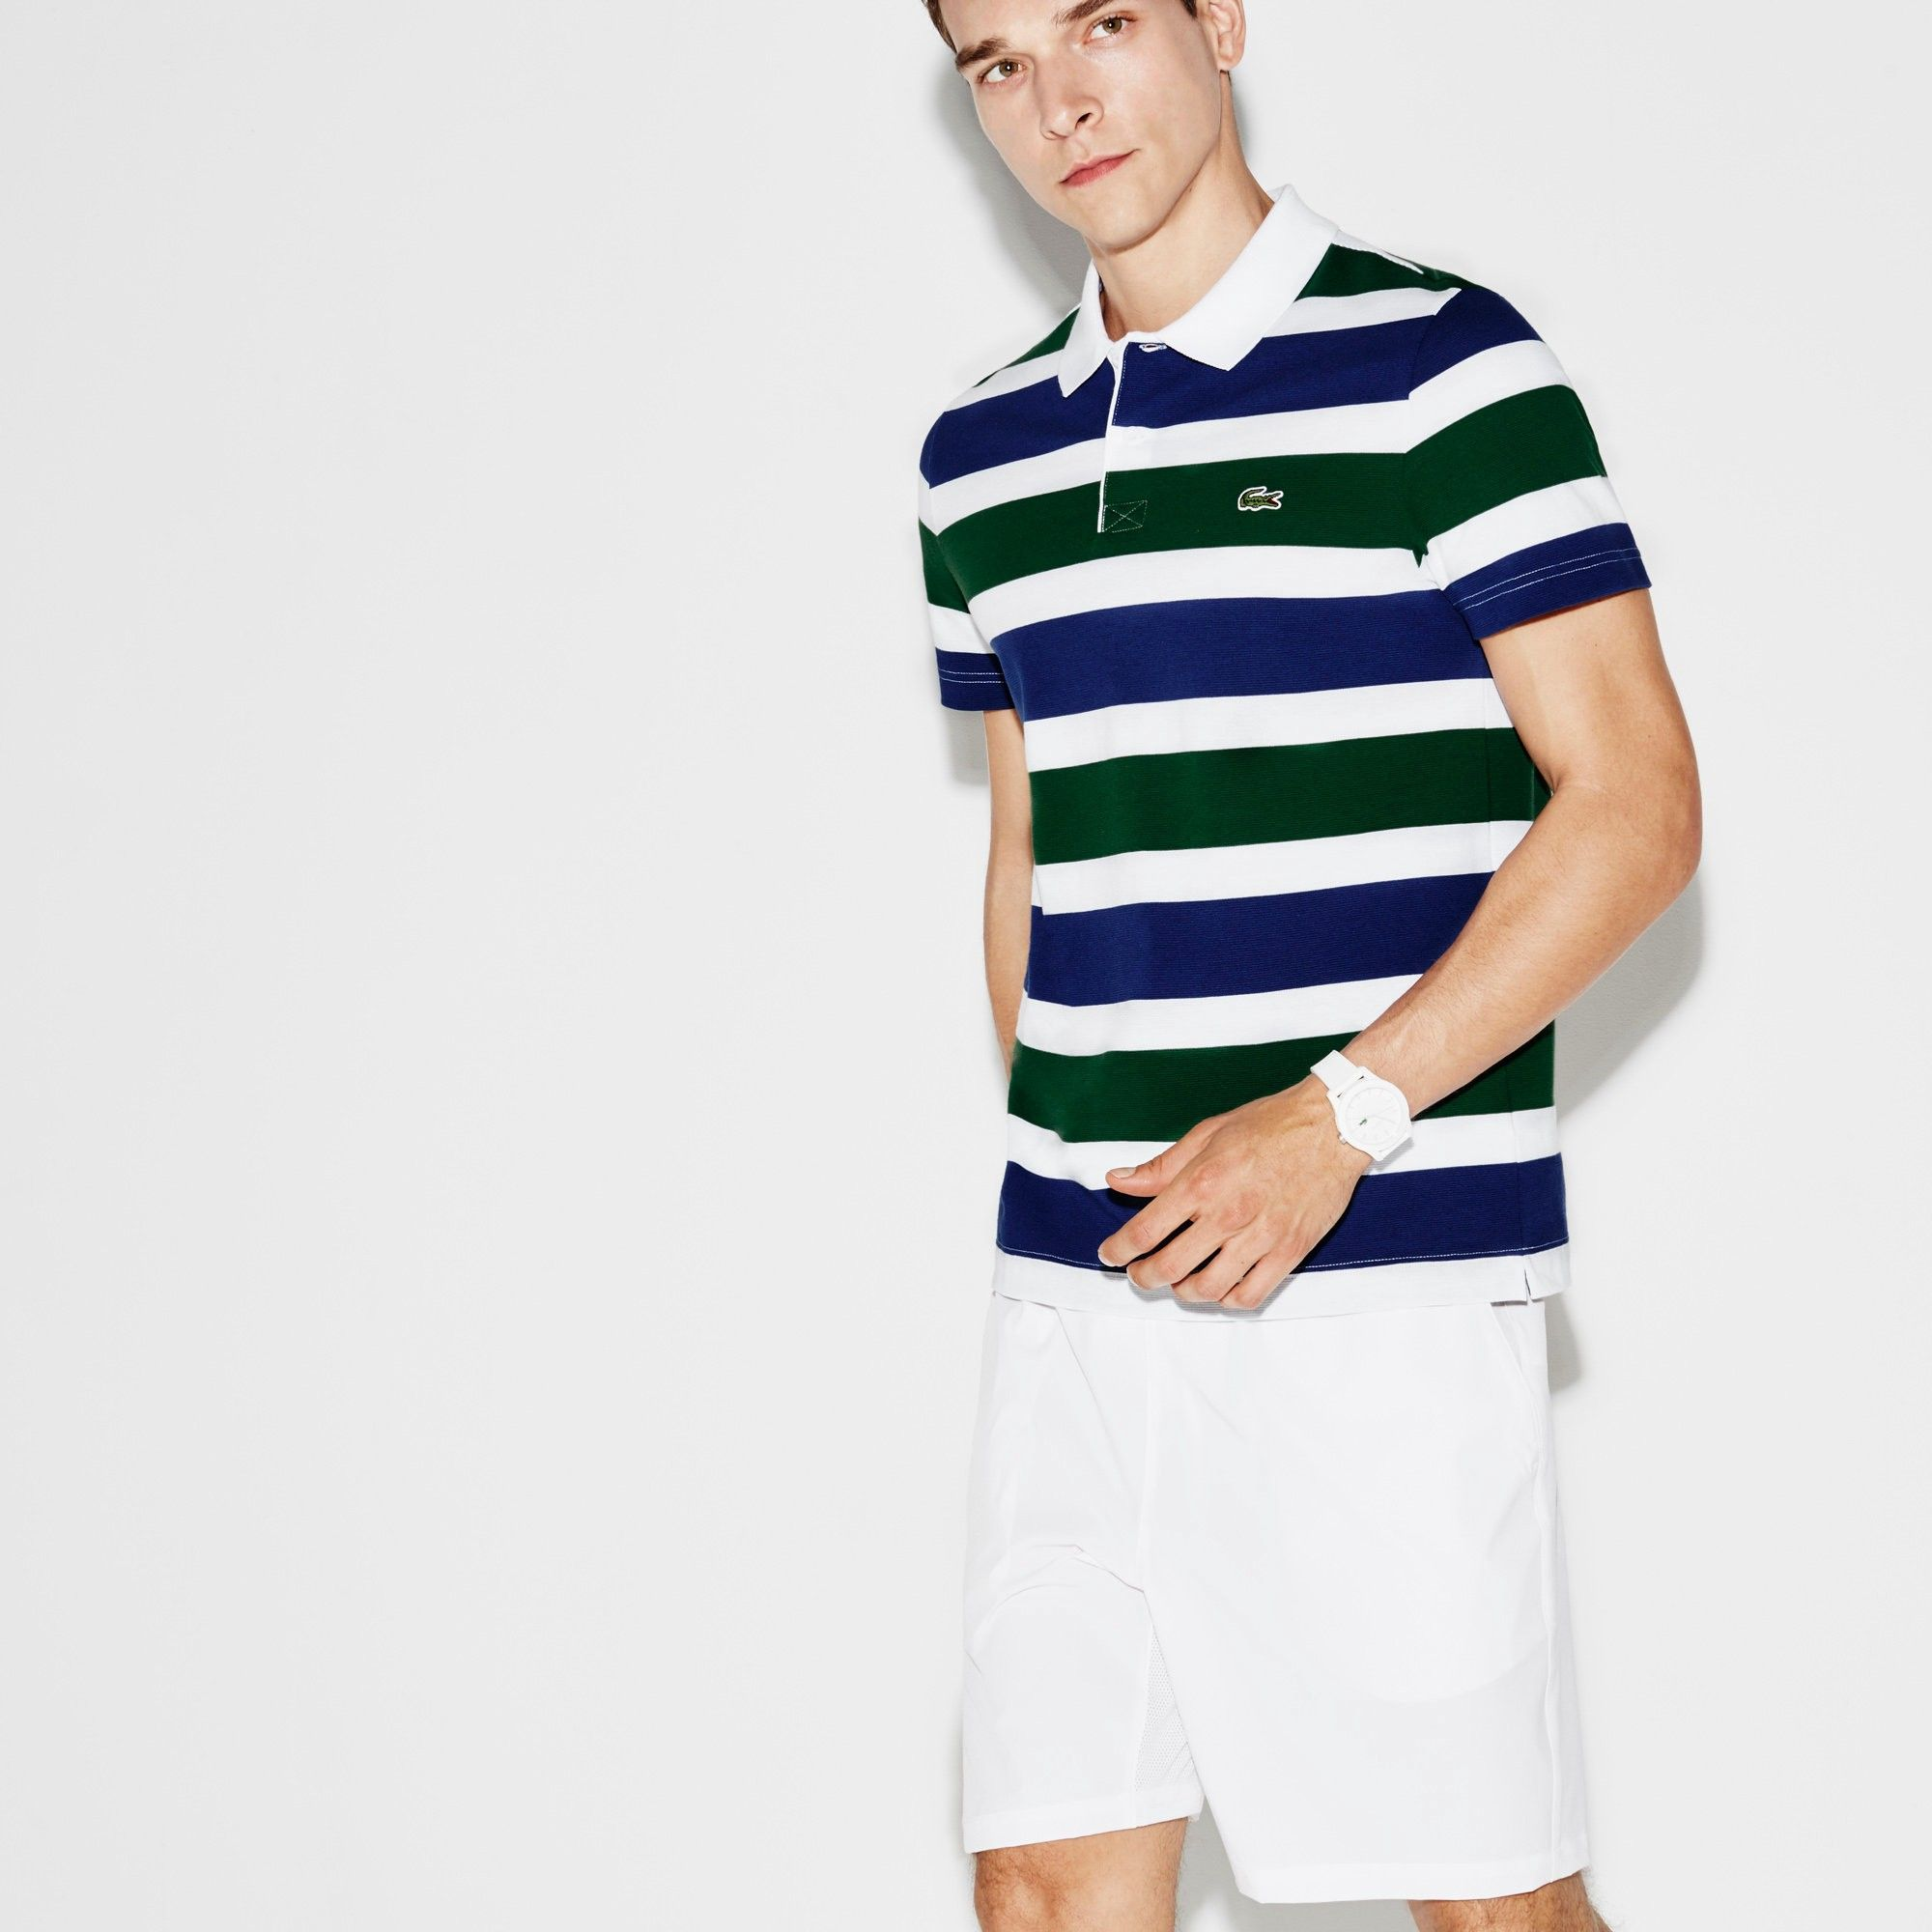 e7bb2b7c06 LACOSTE Men's Lacoste SPORT Tennis Ultra-Light Striped Knit Polo ...